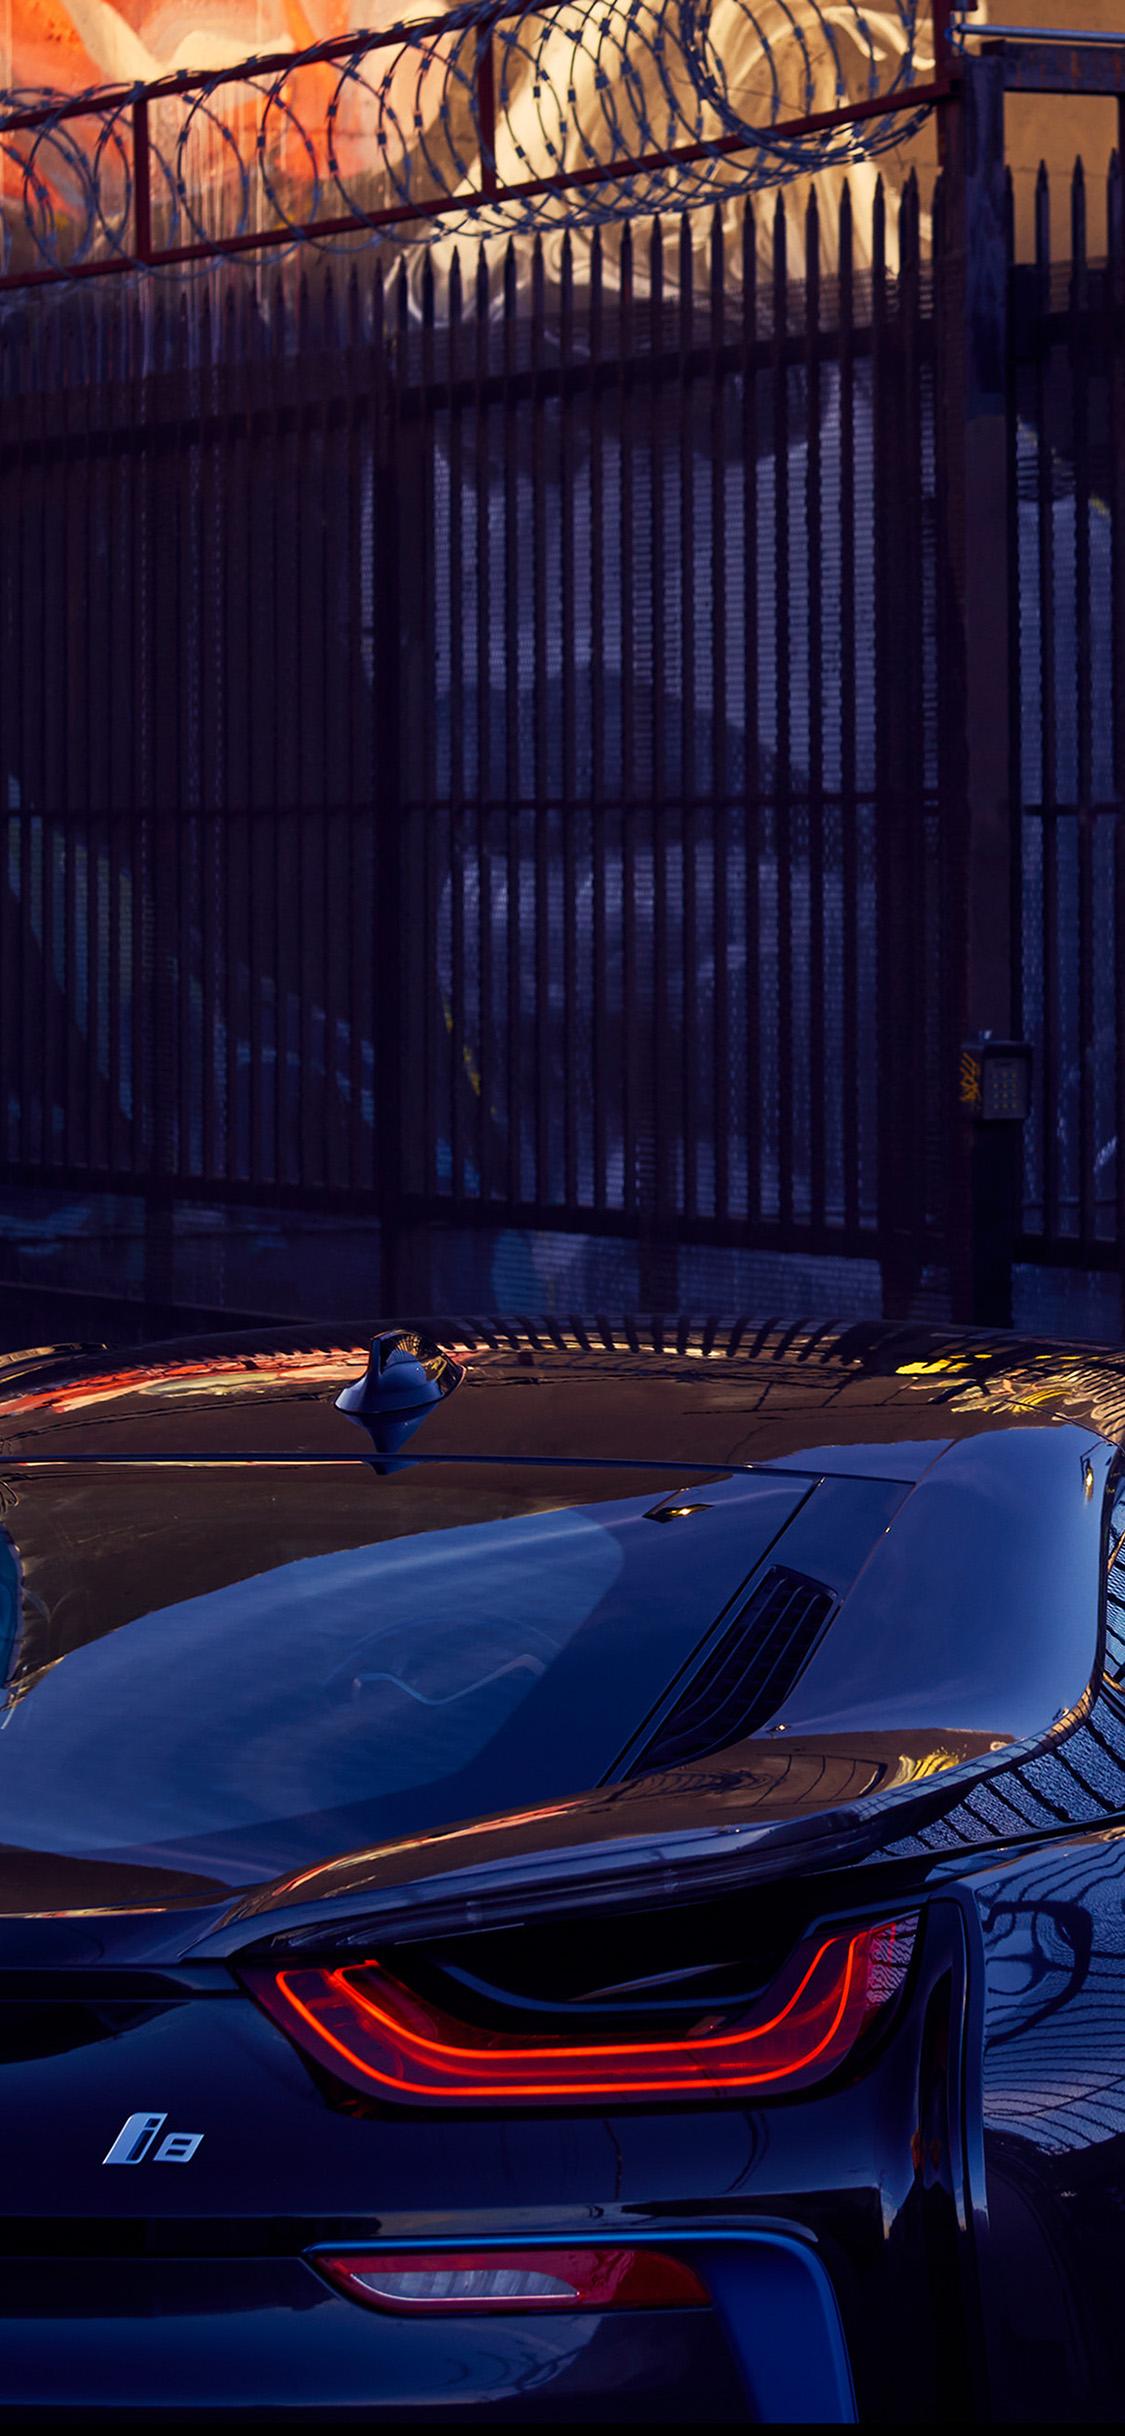 Desktop, tablet, iphone 8, iphone 8 plus, iphone x, sasmsung galaxy, etc. Iphone11papers Com Iphone11 Wallpaper Bk58 Art Car Bmw Blue Reflection